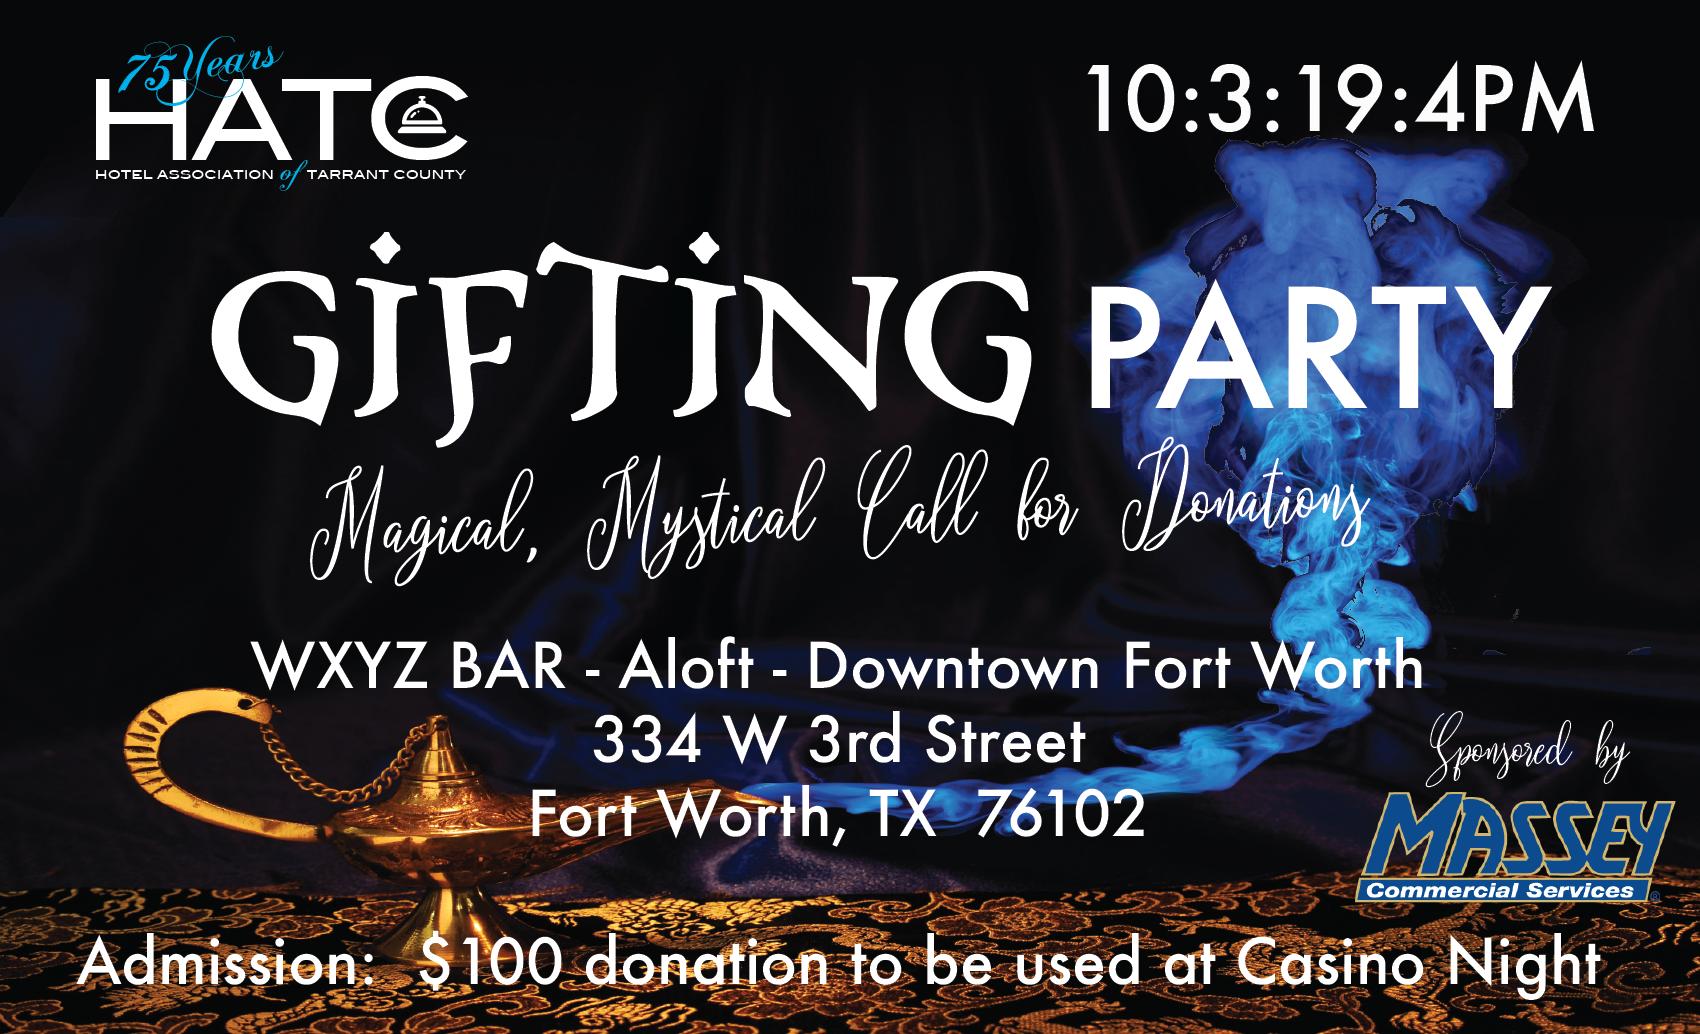 HATC Casino Arabian Nights Gifting Party 2019